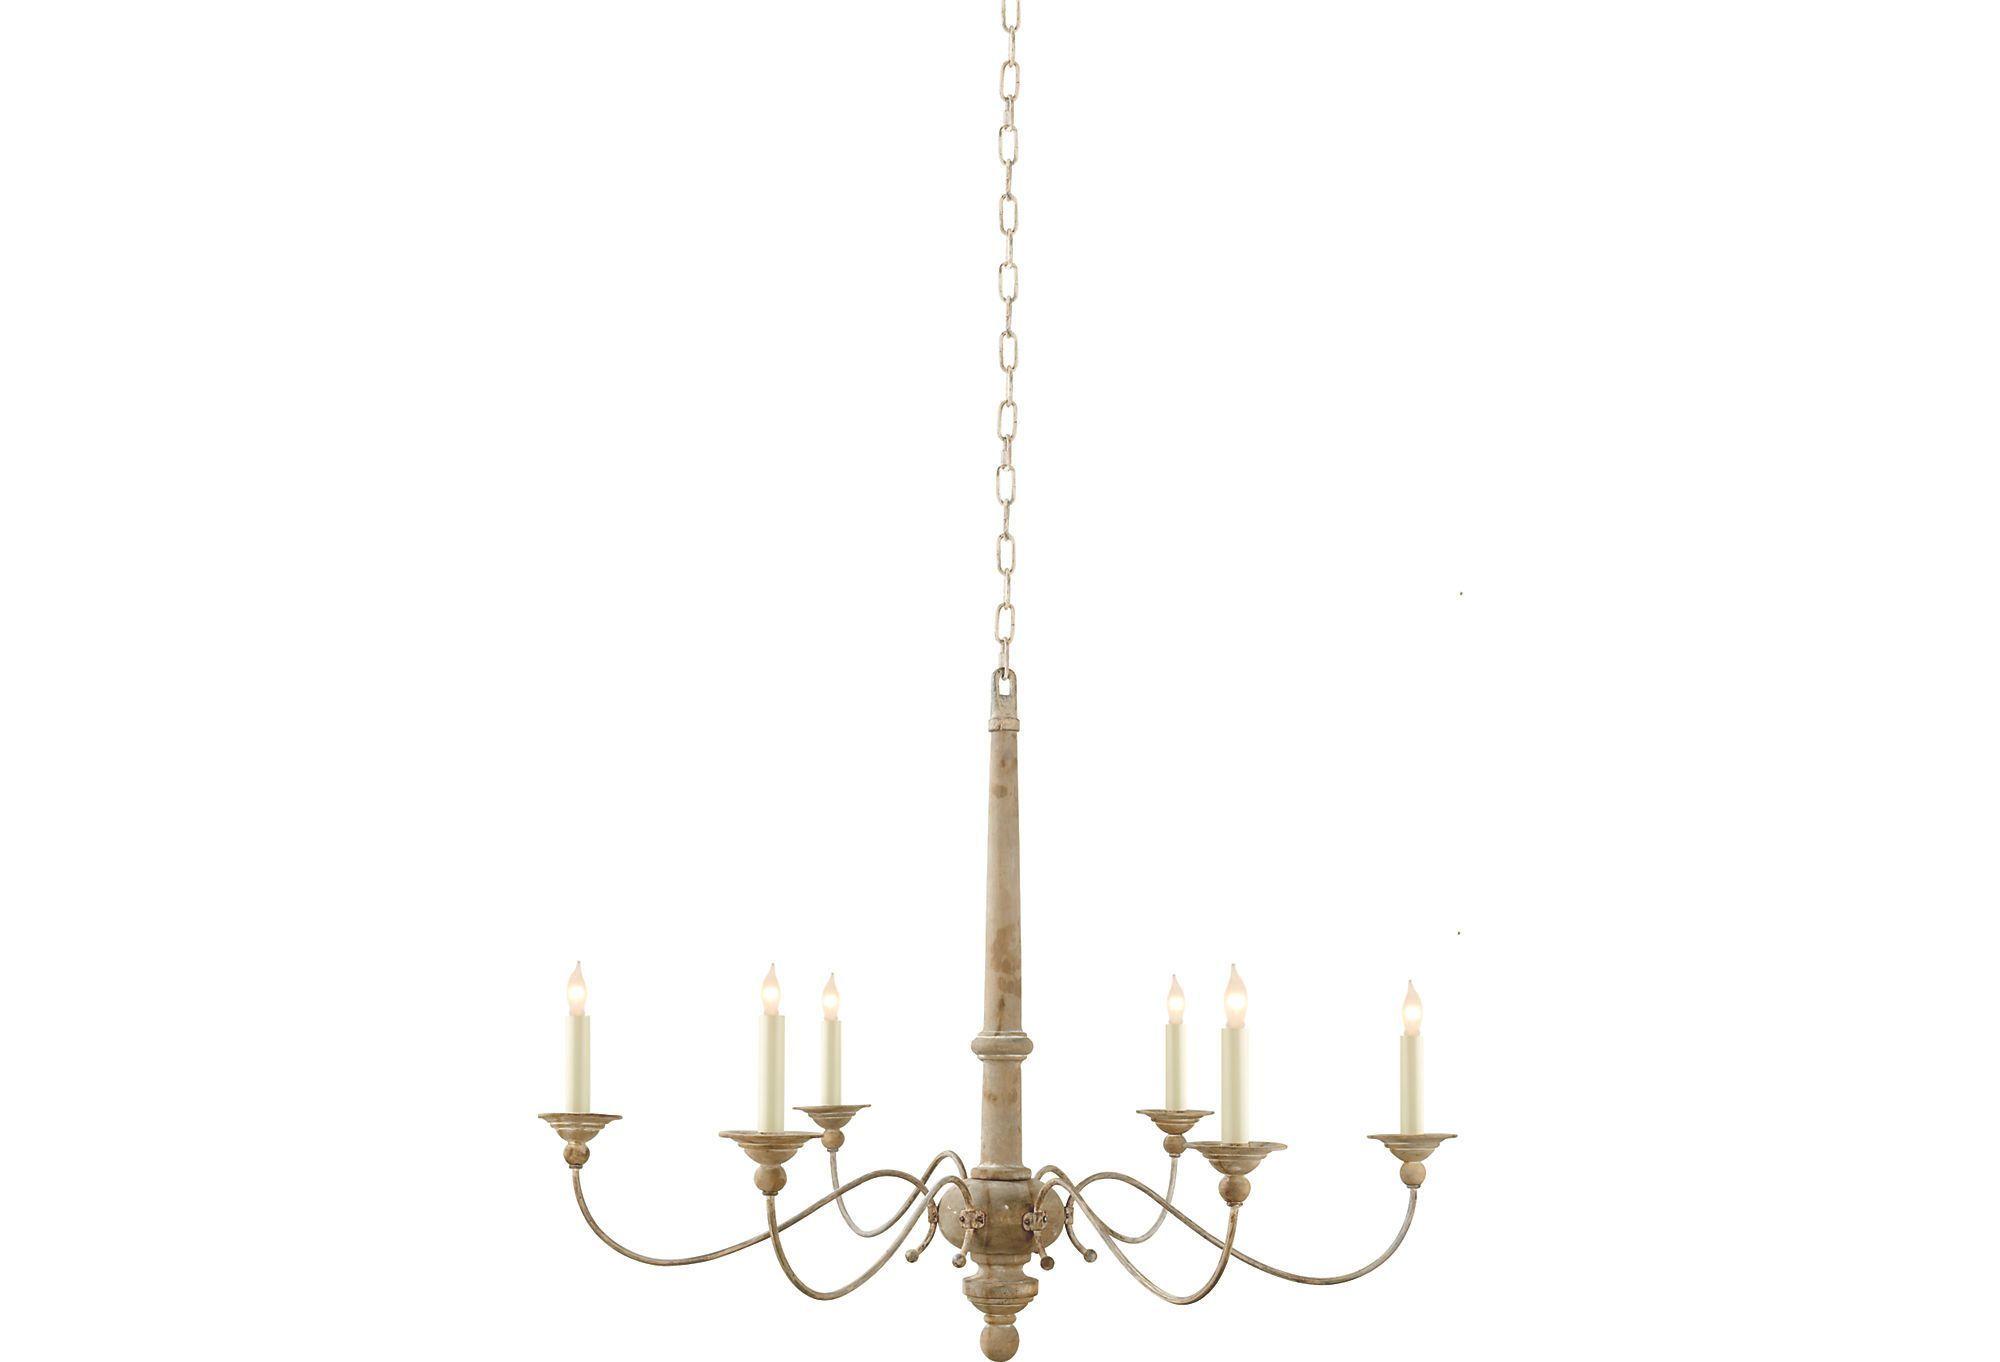 Country chandelier belgian white one kings lane lighting country chandelier belgian white one kings lane arubaitofo Images